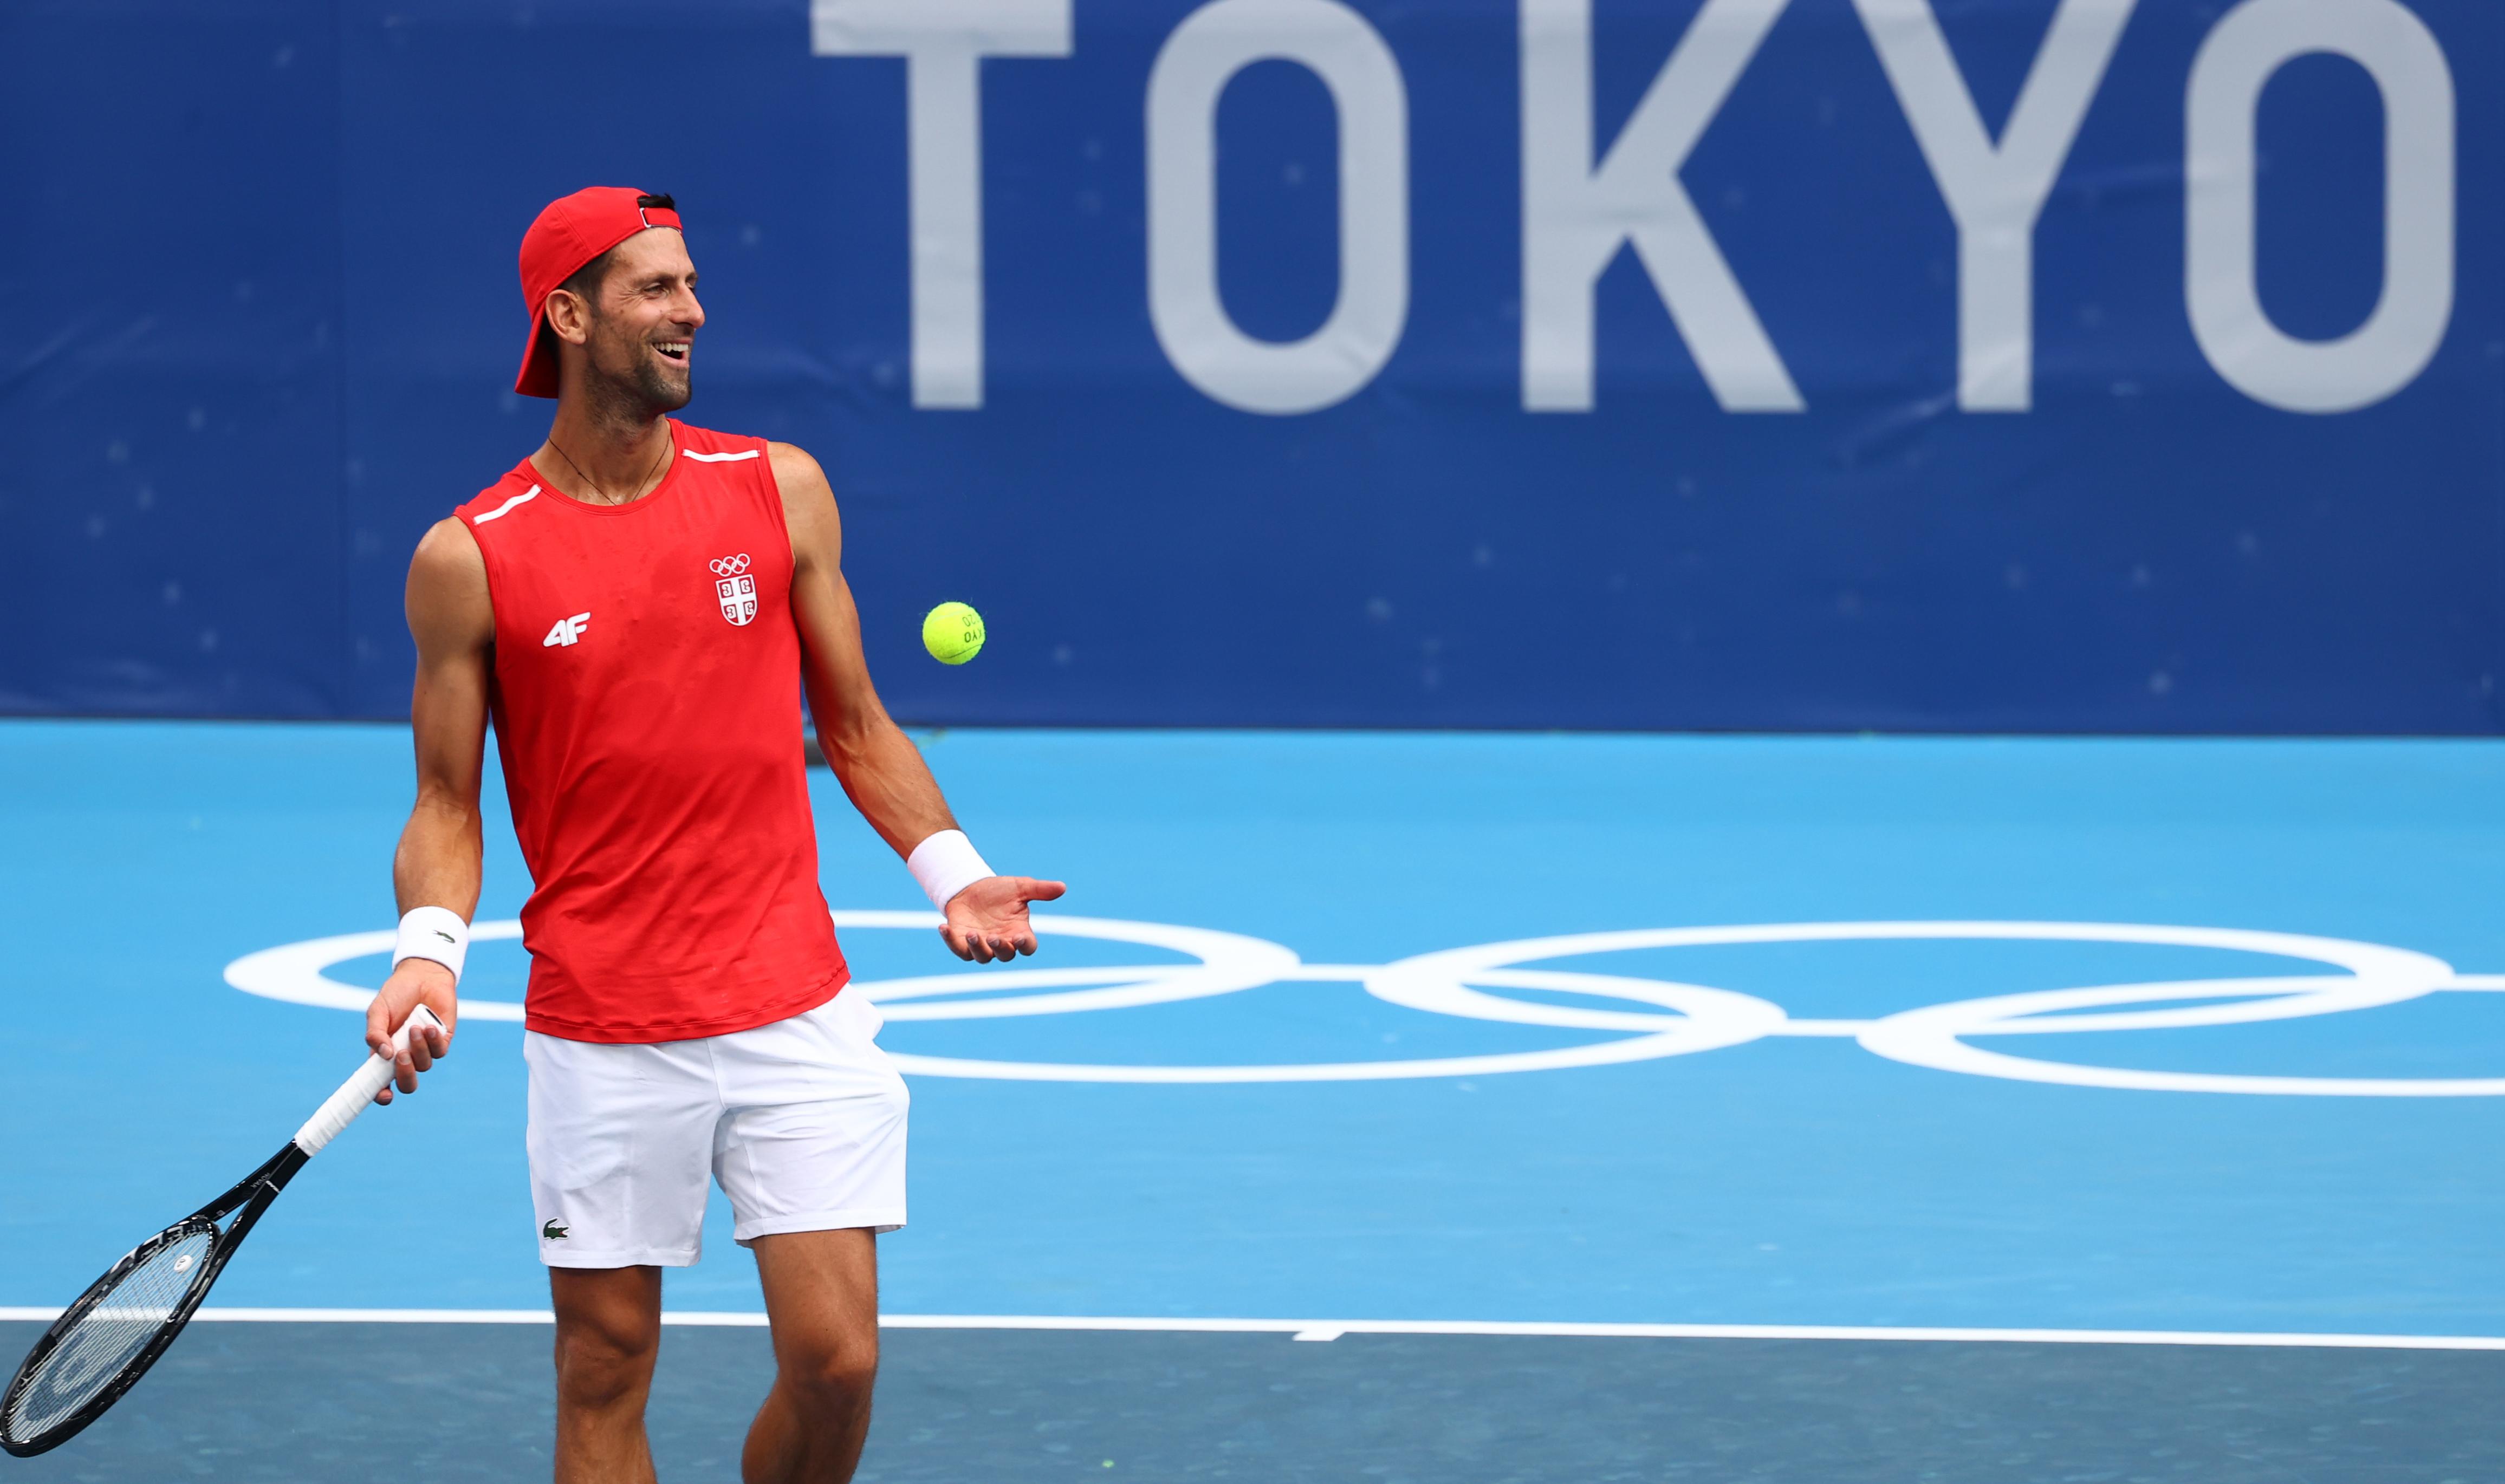 Tokyo 2020 Olympics - Tennis Training - Ariake Tennis Park, Tokyo, Japan - July 22, 2021 Novak Djokovic of Serbia during training. REUTERS/Mike Segar